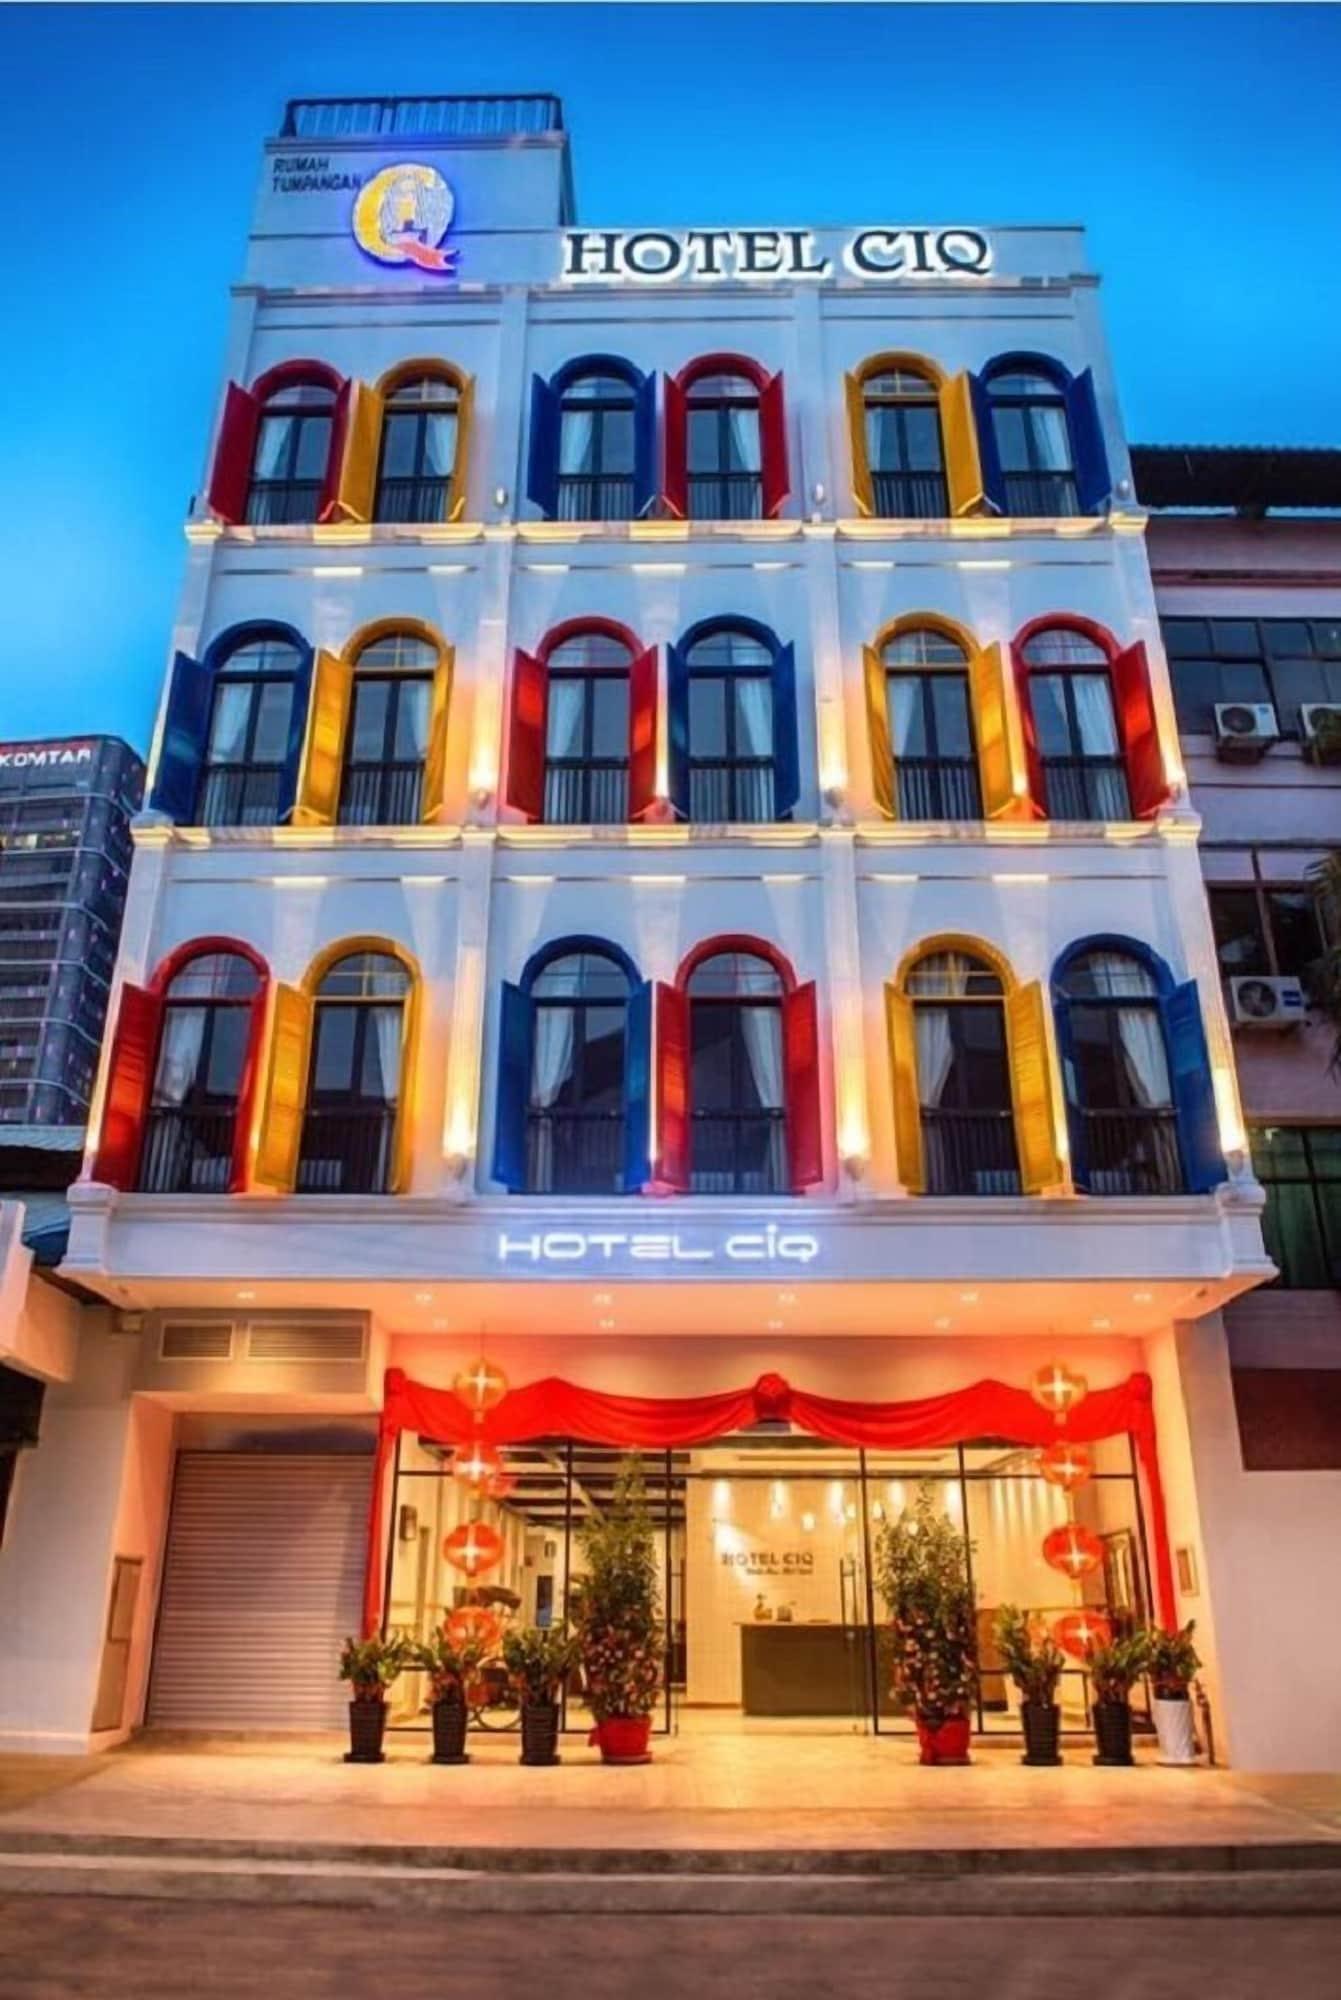 CIQ HOTEL at Jalan Trus, Johor Bahru